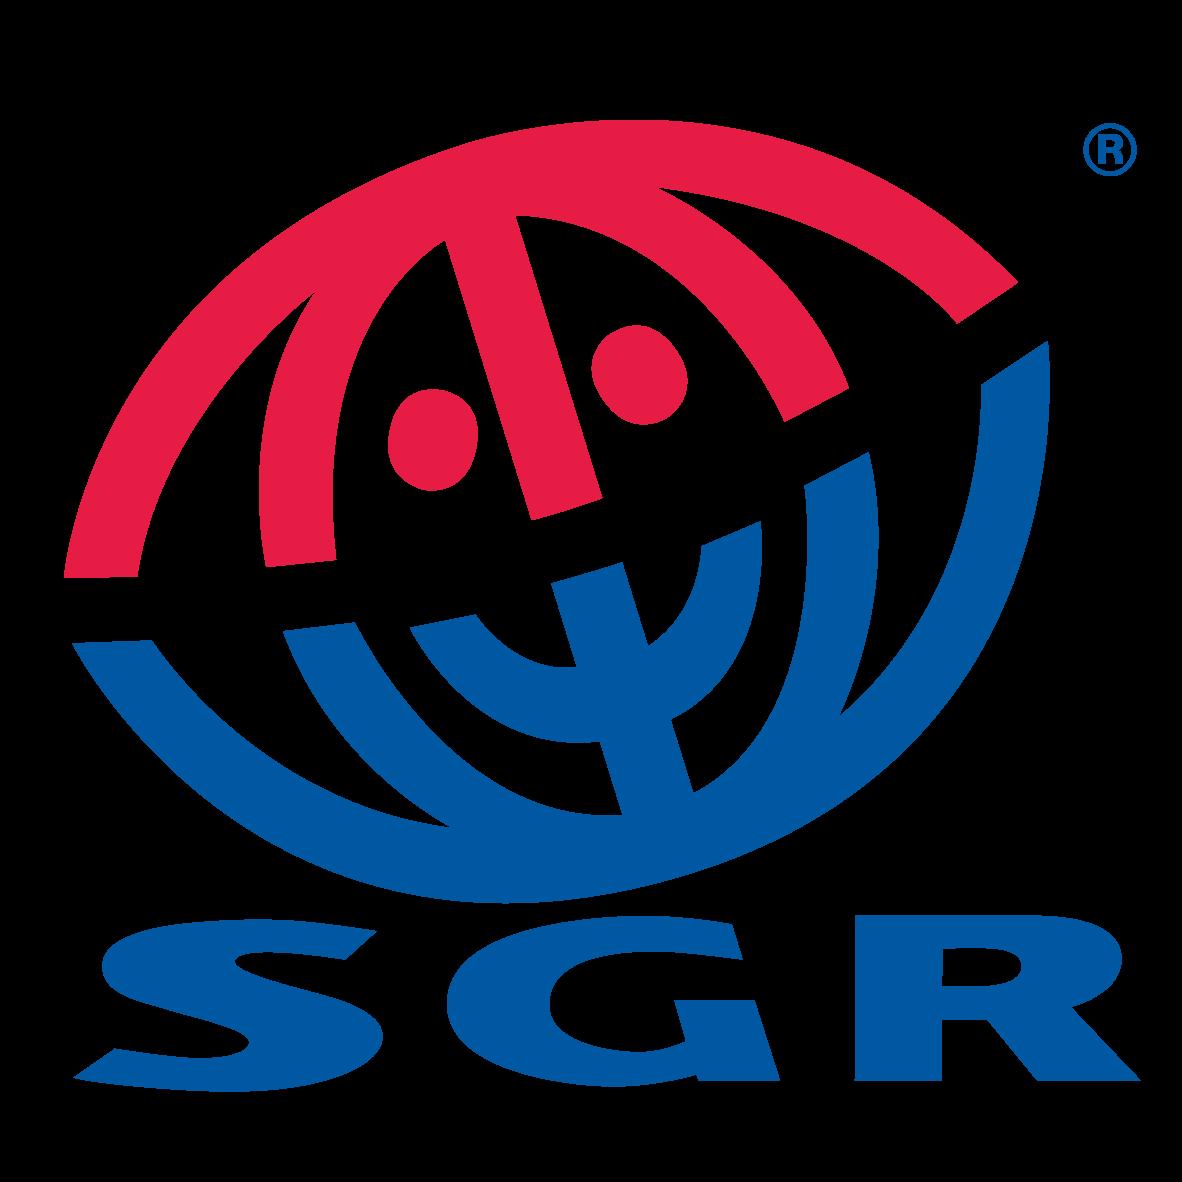 SGR png zonder achtergrond.png